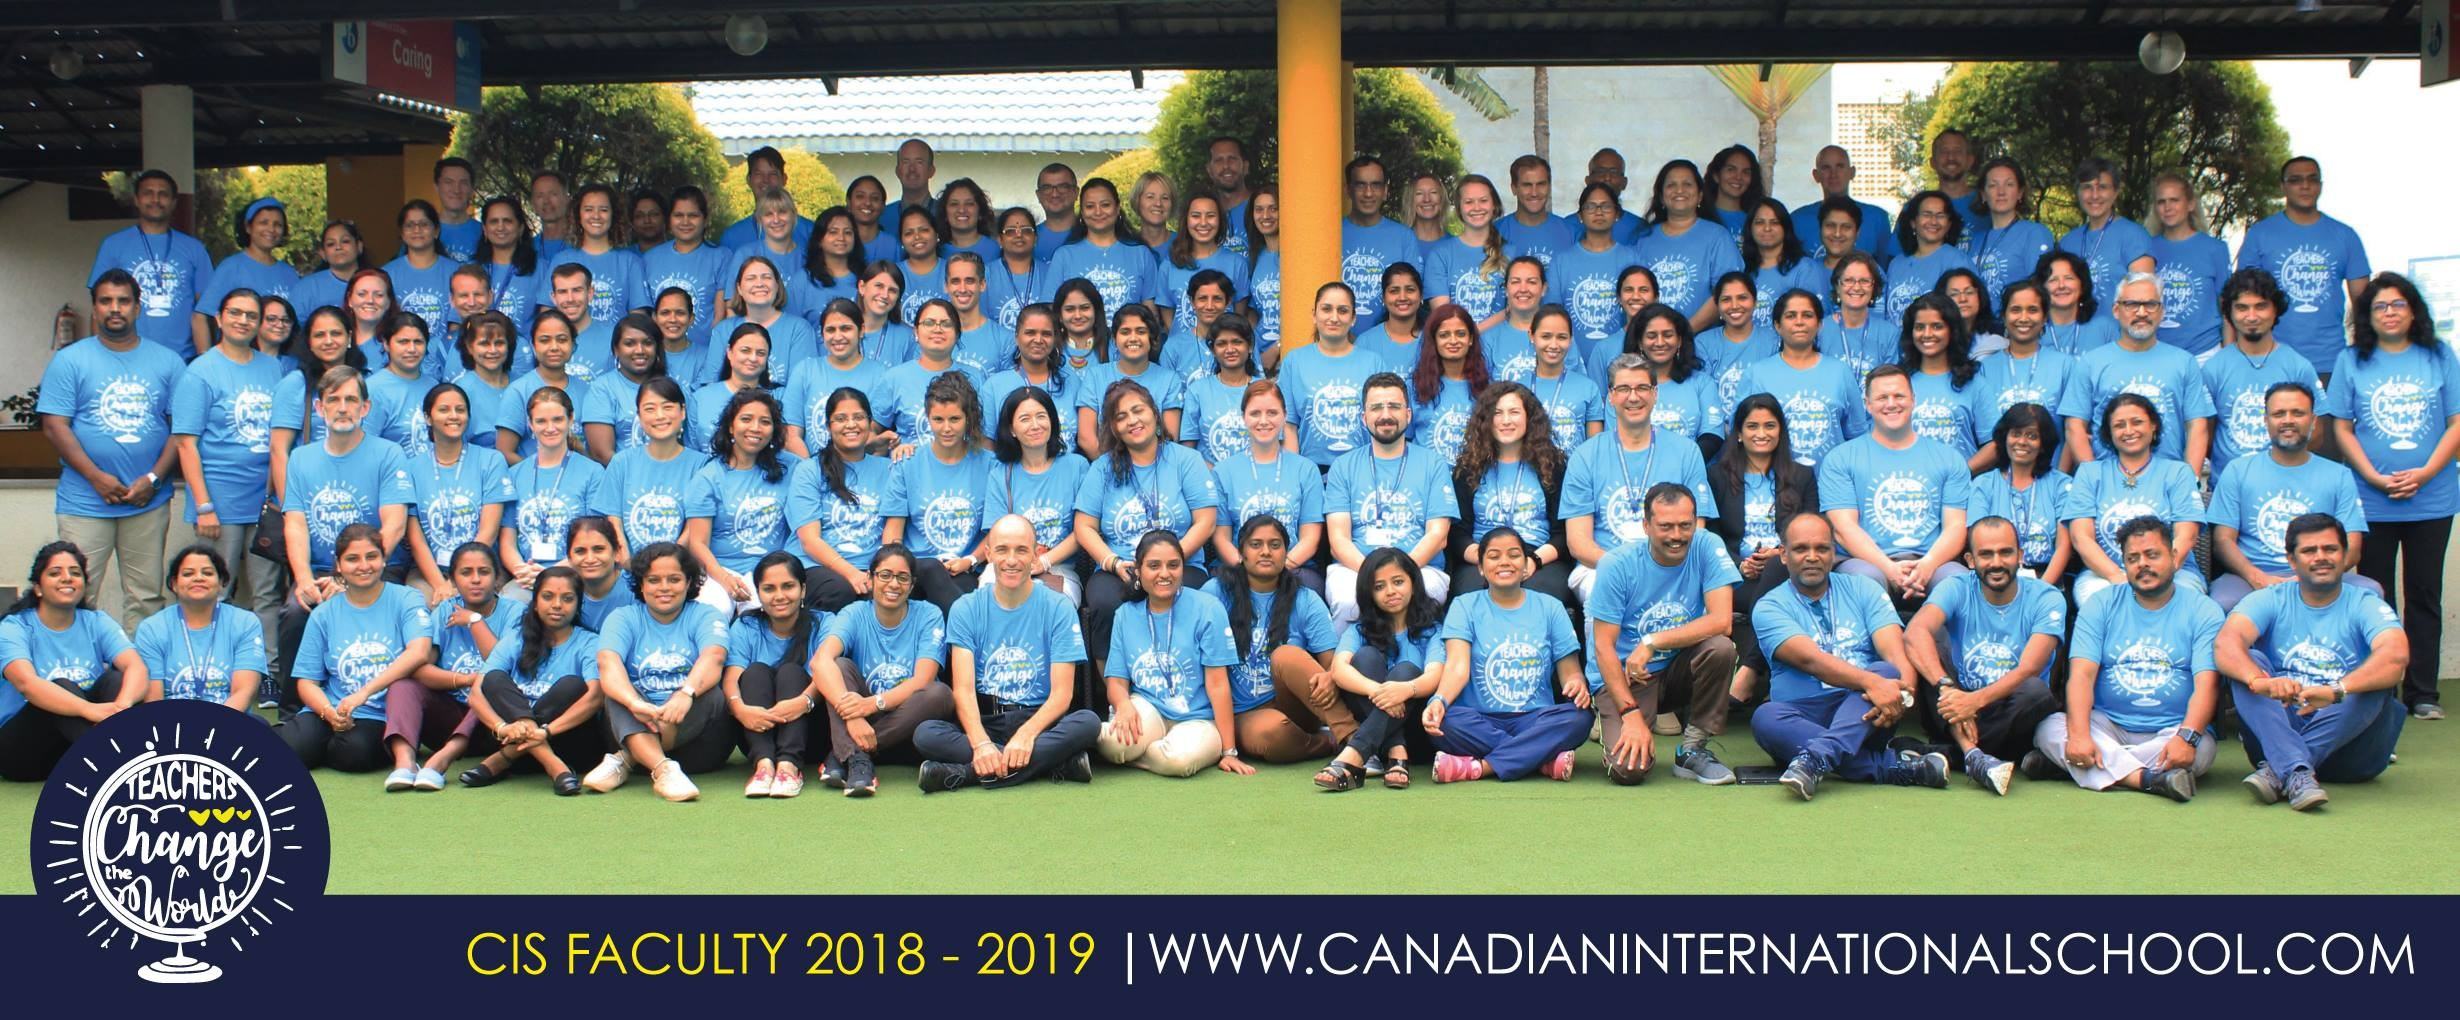 Canadian International School Bangalore | LinkedIn